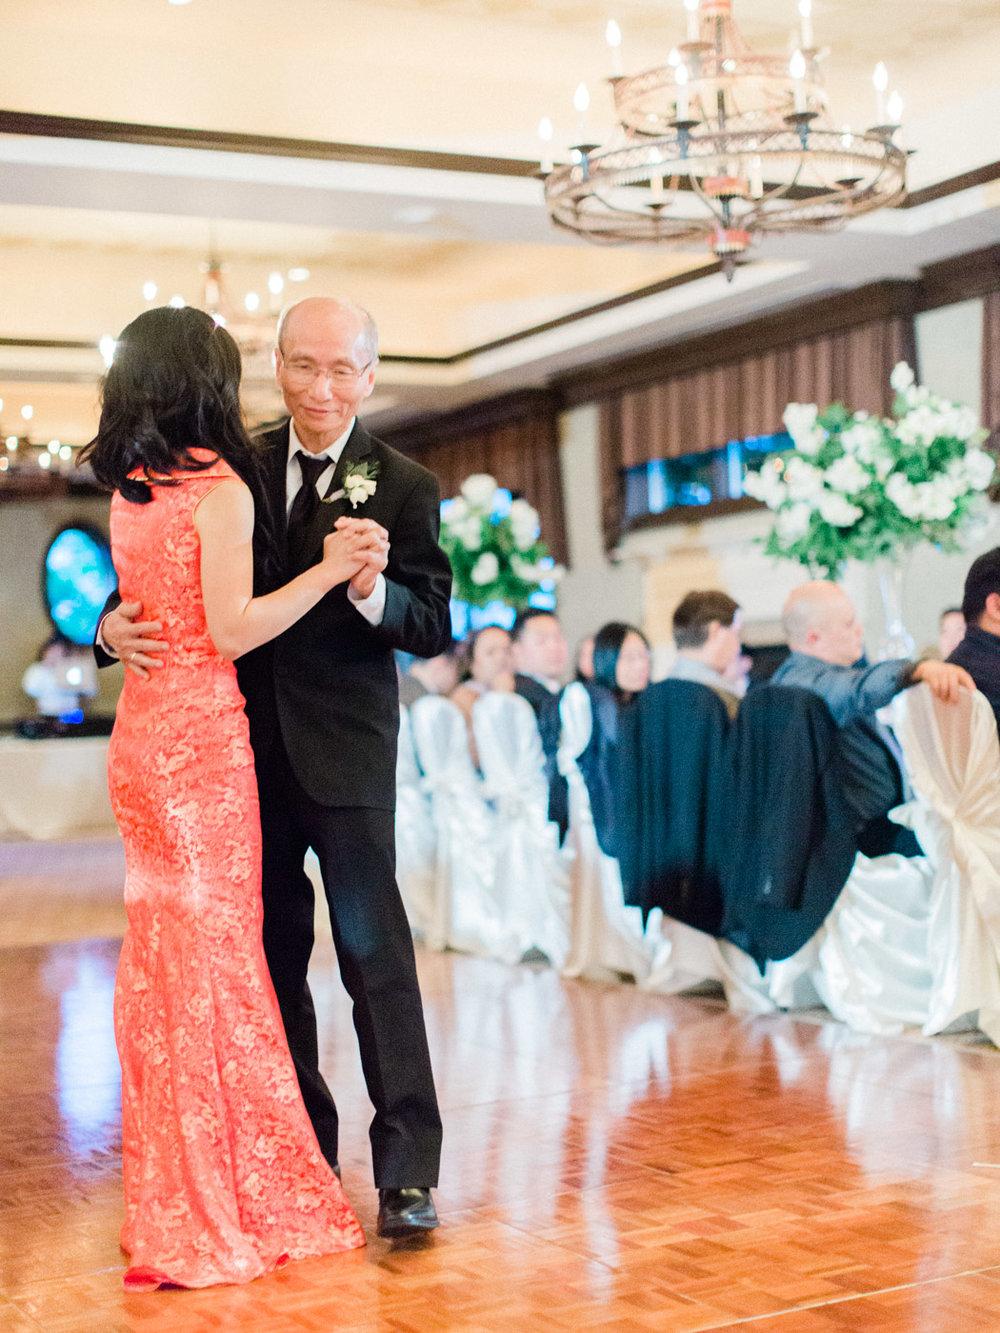 toronto-wedding-photographer-fine-art-documentary-elegant-toronto-golf-club-kings-riding-230.jpg